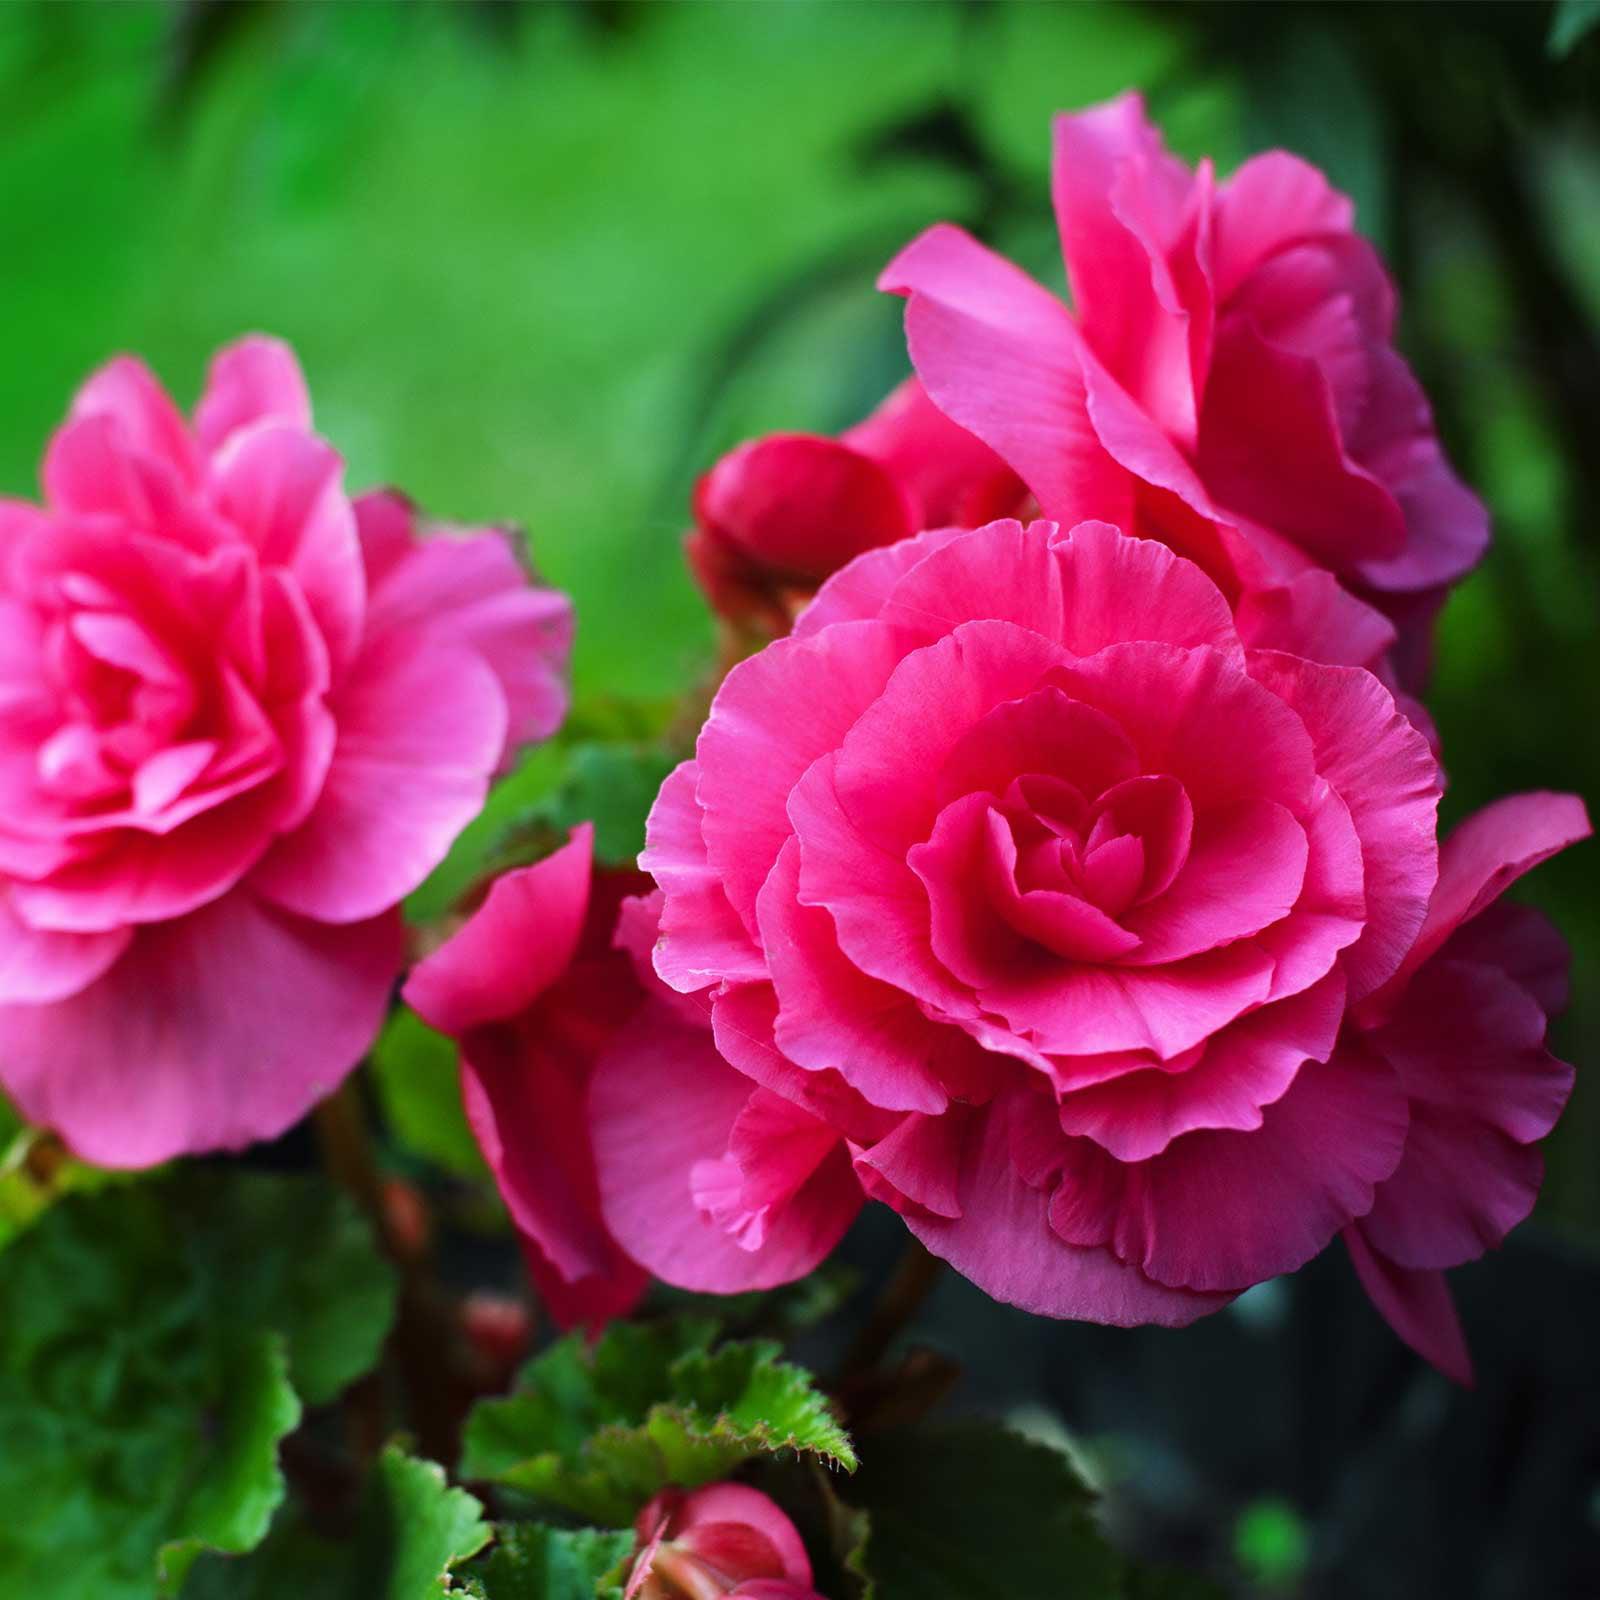 Tuberous Begonia Nonstop Series Plant Seeds (Pelleted): Deep Rose - 100 Seeds - Annual Decorative Flower Plant, Houseplant